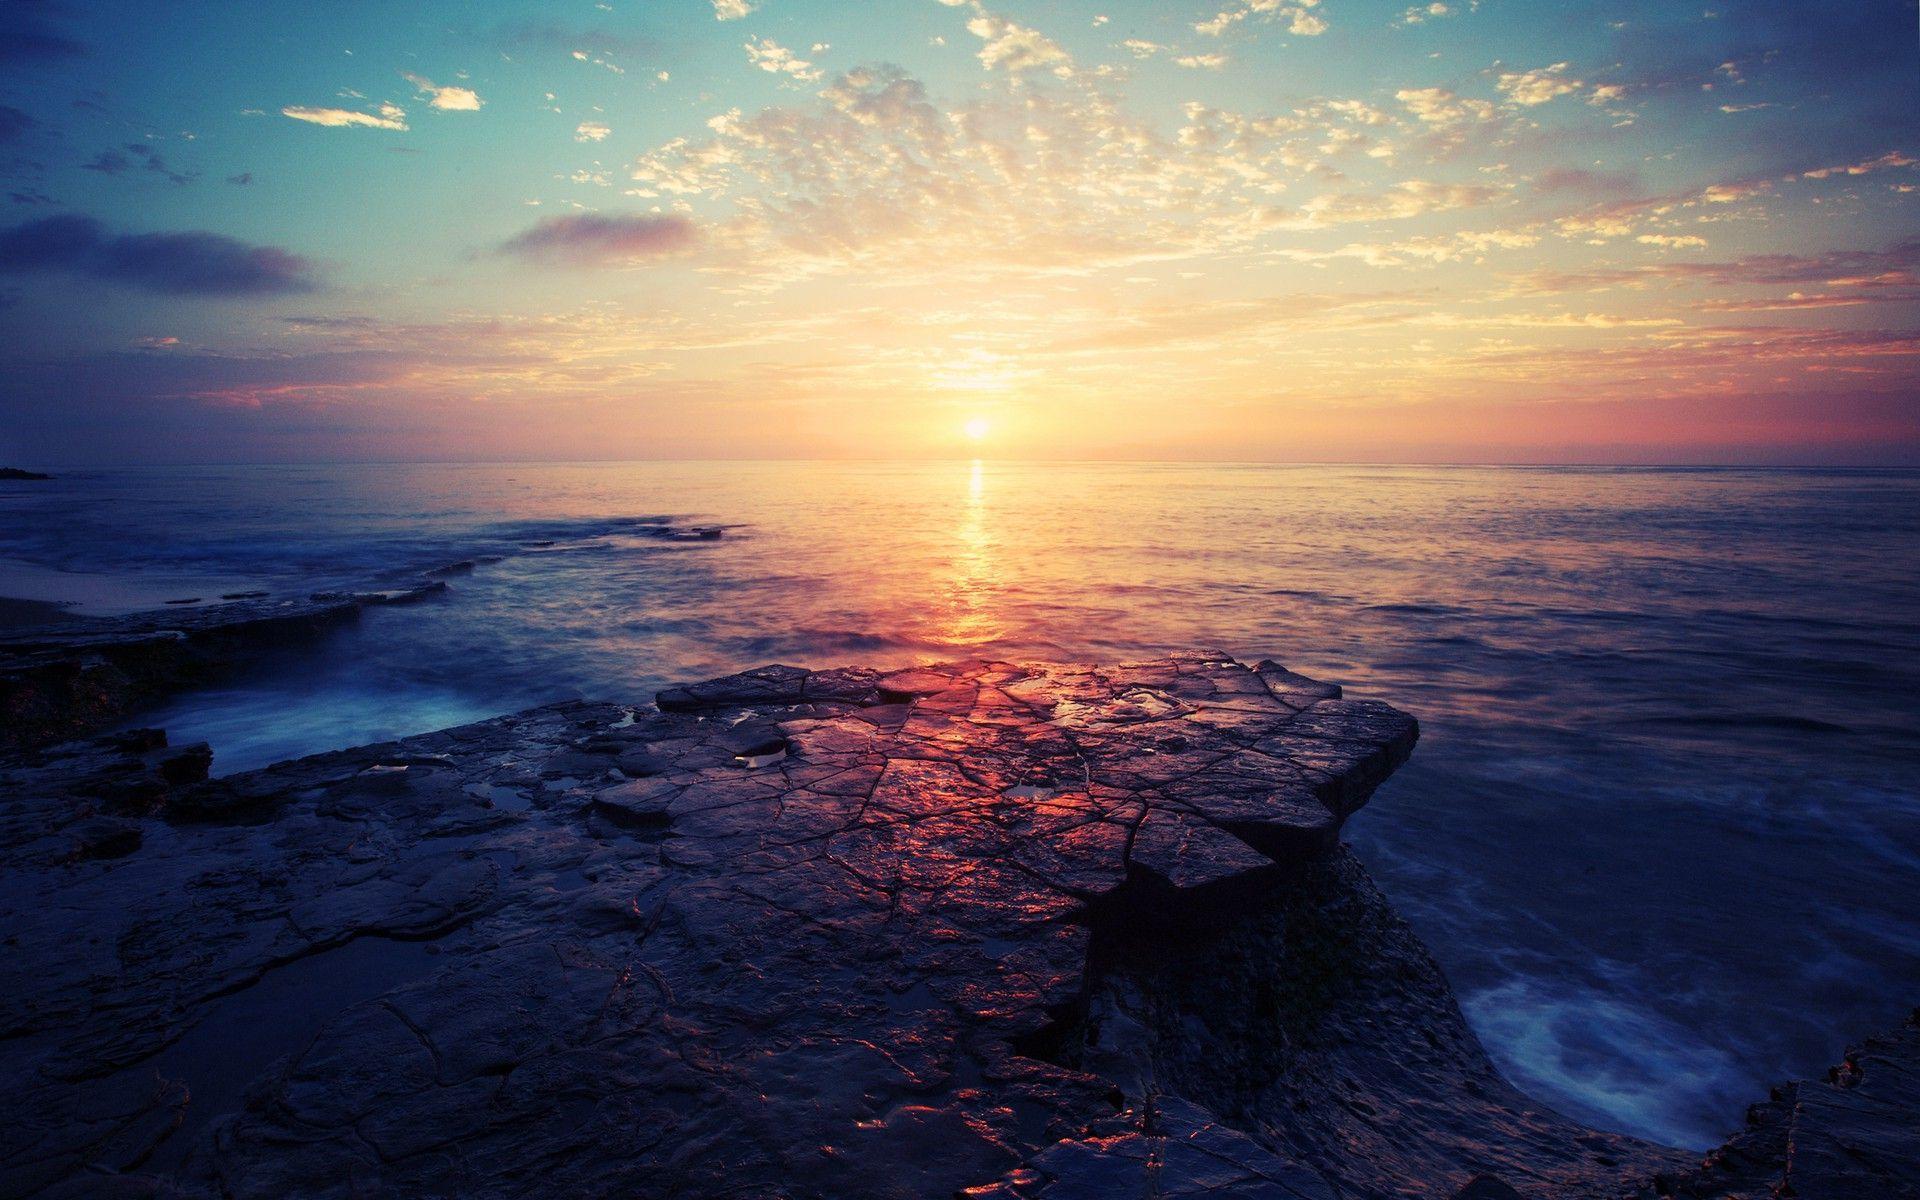 Colorful sunrise Wallpaper #